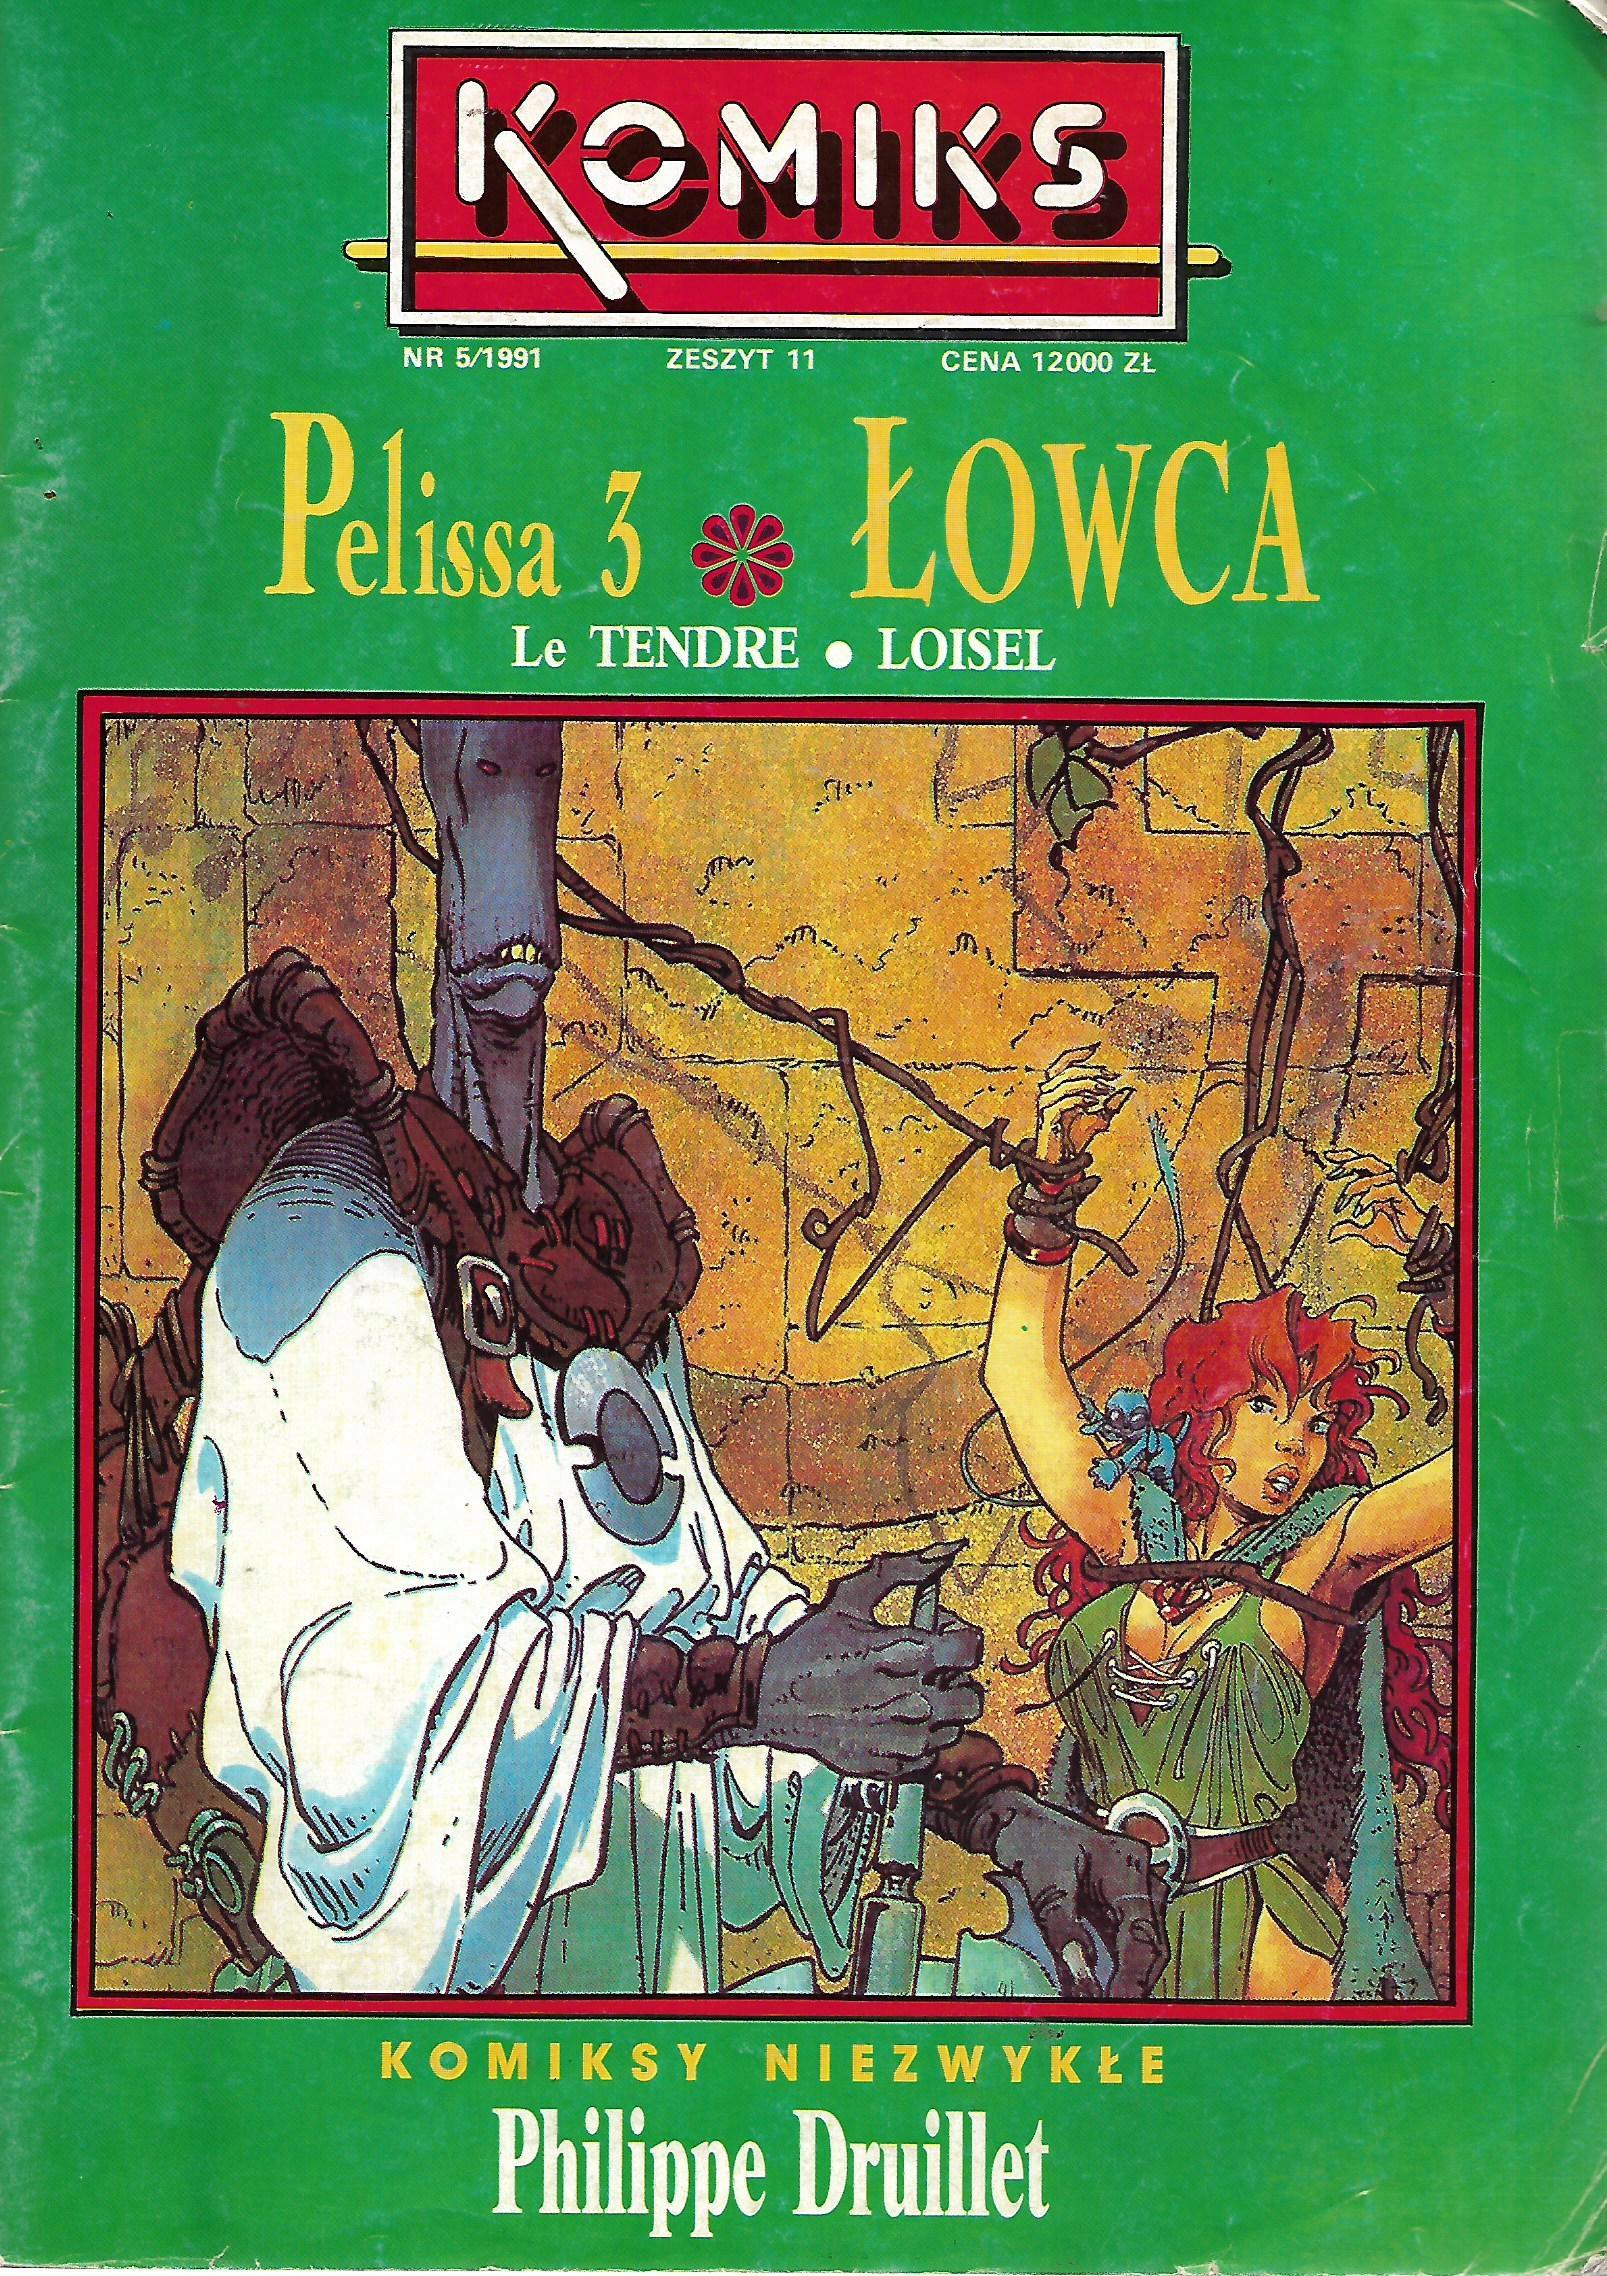 ! ŁOWCA PELISSA 3 KOMIKS